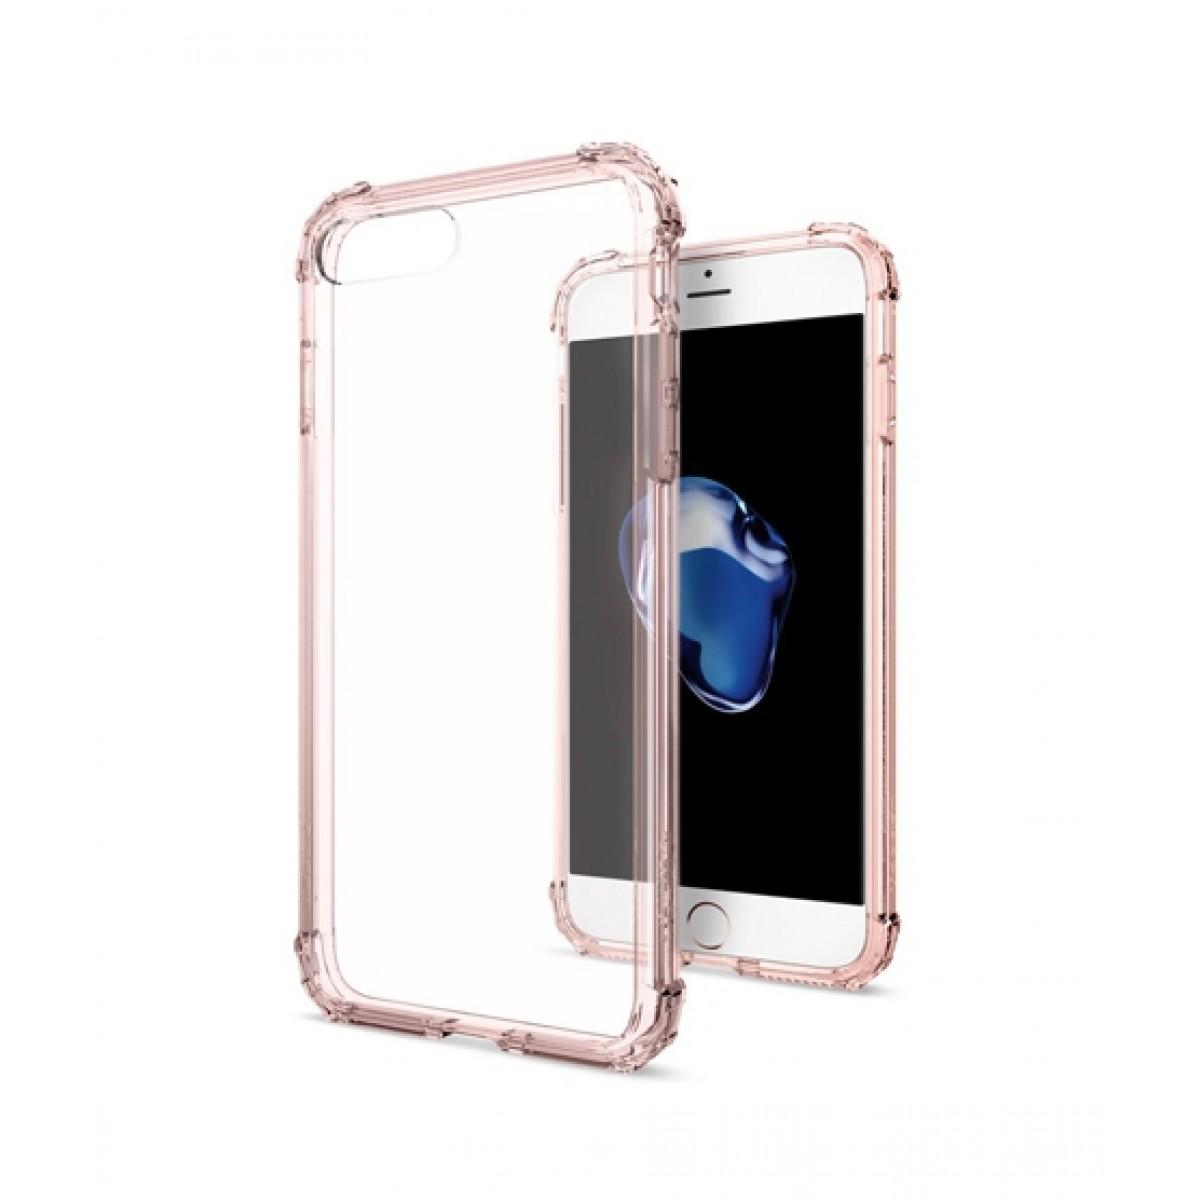 buy popular 71bcf 8e9e9 Spigen Crystal Shell Rose Case For iPhone 8 Plus